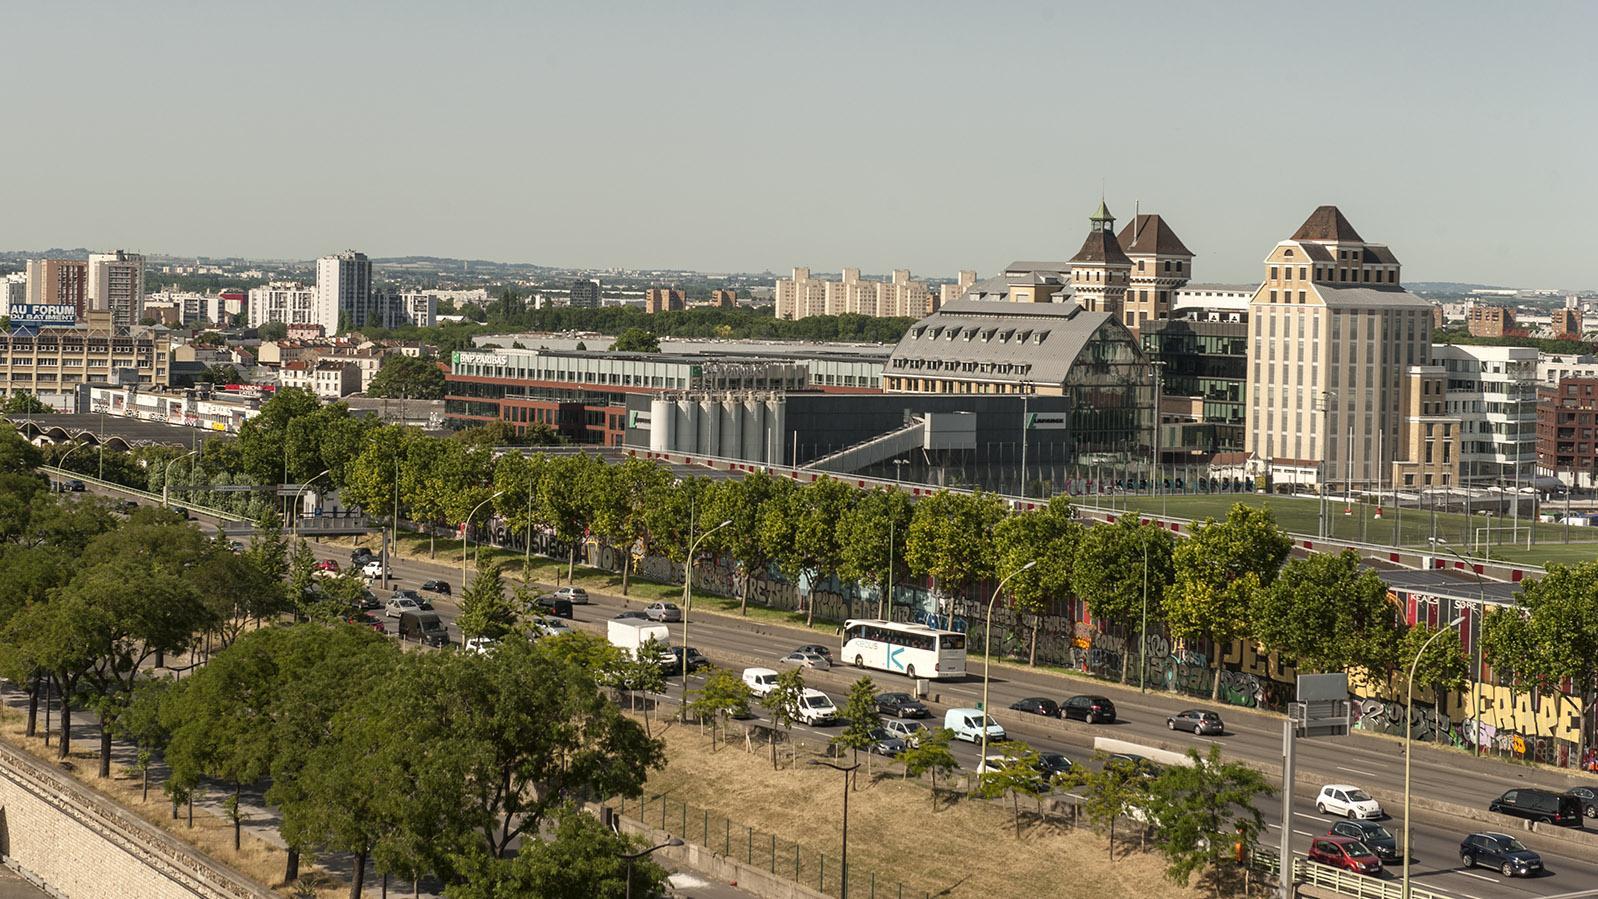 Paris: Blick vom Belvédère auf die Grands Moulins von Pantin, heute Sitz von BNP Paribas. Foto: Hilke Maunder